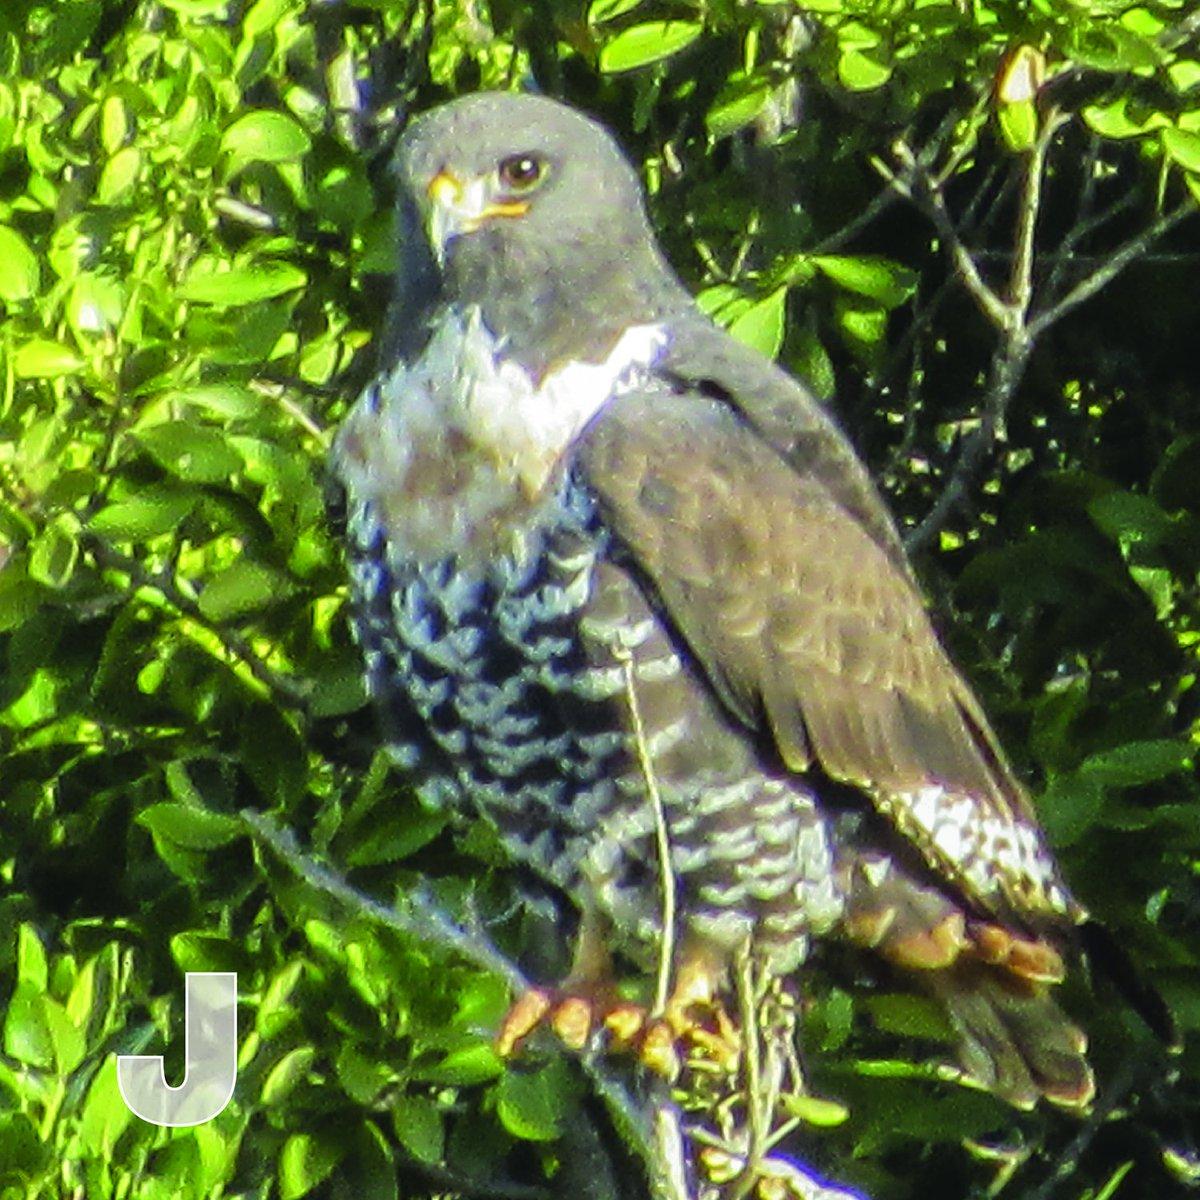 J is for Jackal Buzzard. A striking South African bird of Prey. So pretty too. #atoz #birdlife #jackalbuzzard #bird #birds #southafrica #naturepic.twitter.com/ik0mKeiP9E